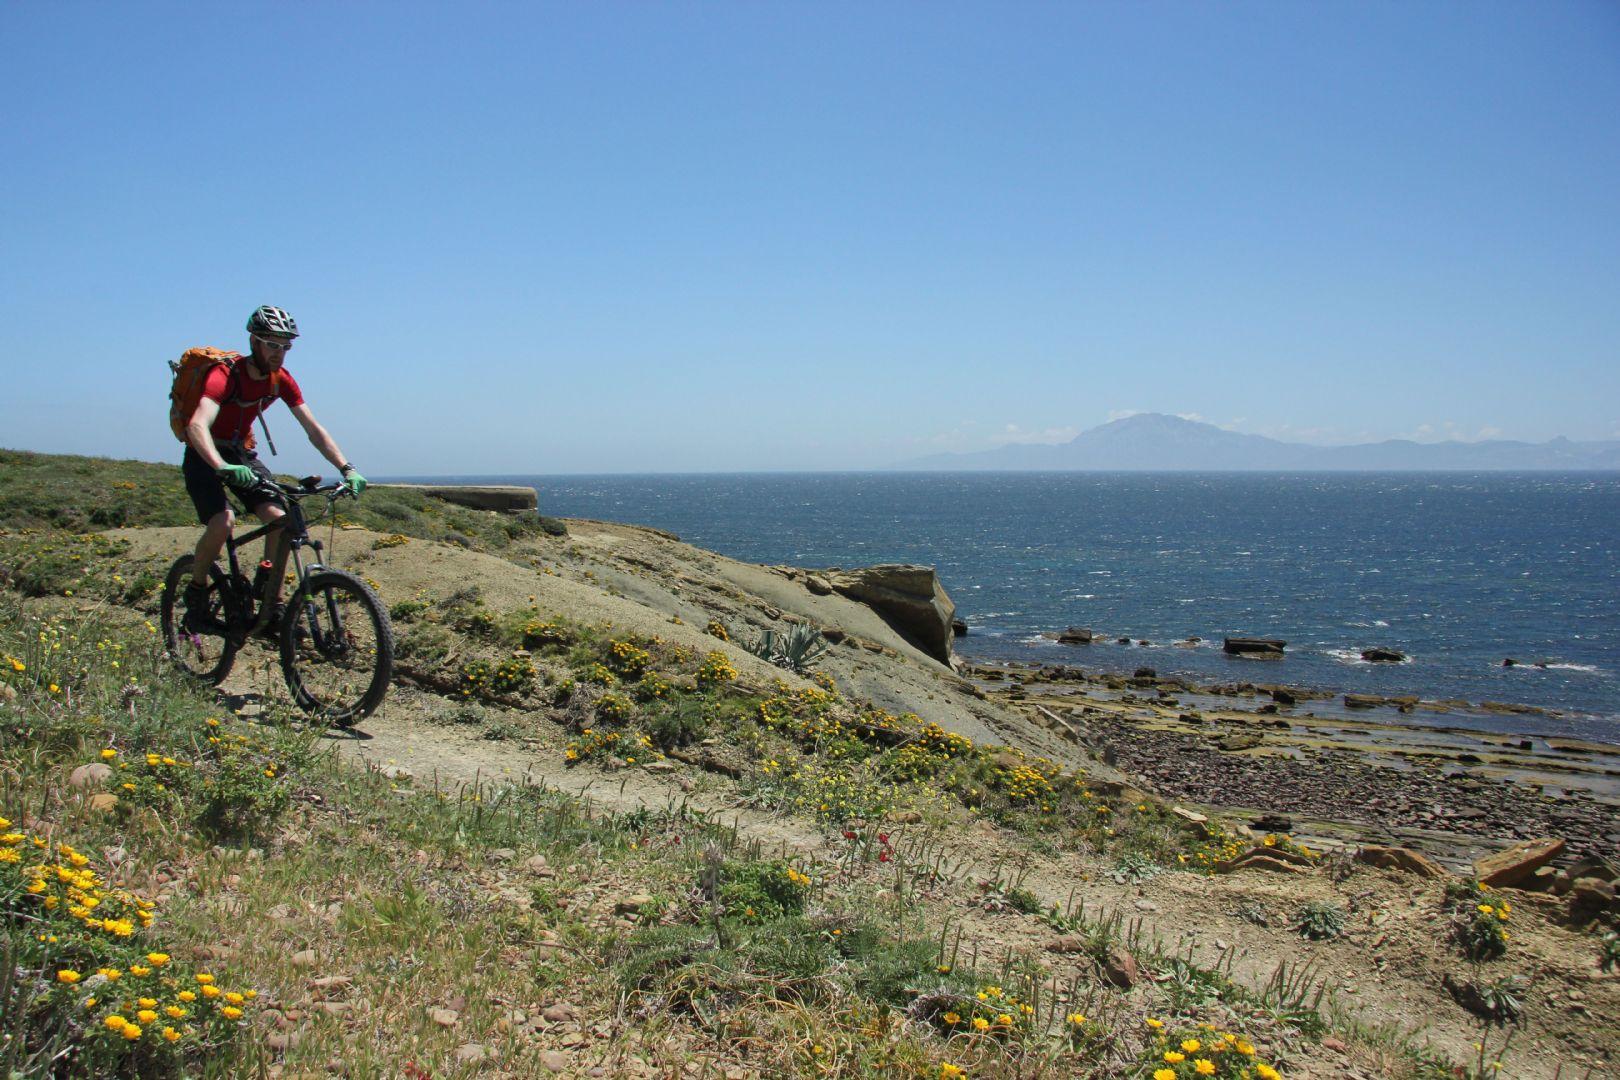 IMG_9458.JPG - Spain - Trans Andaluz - Mountain Biking